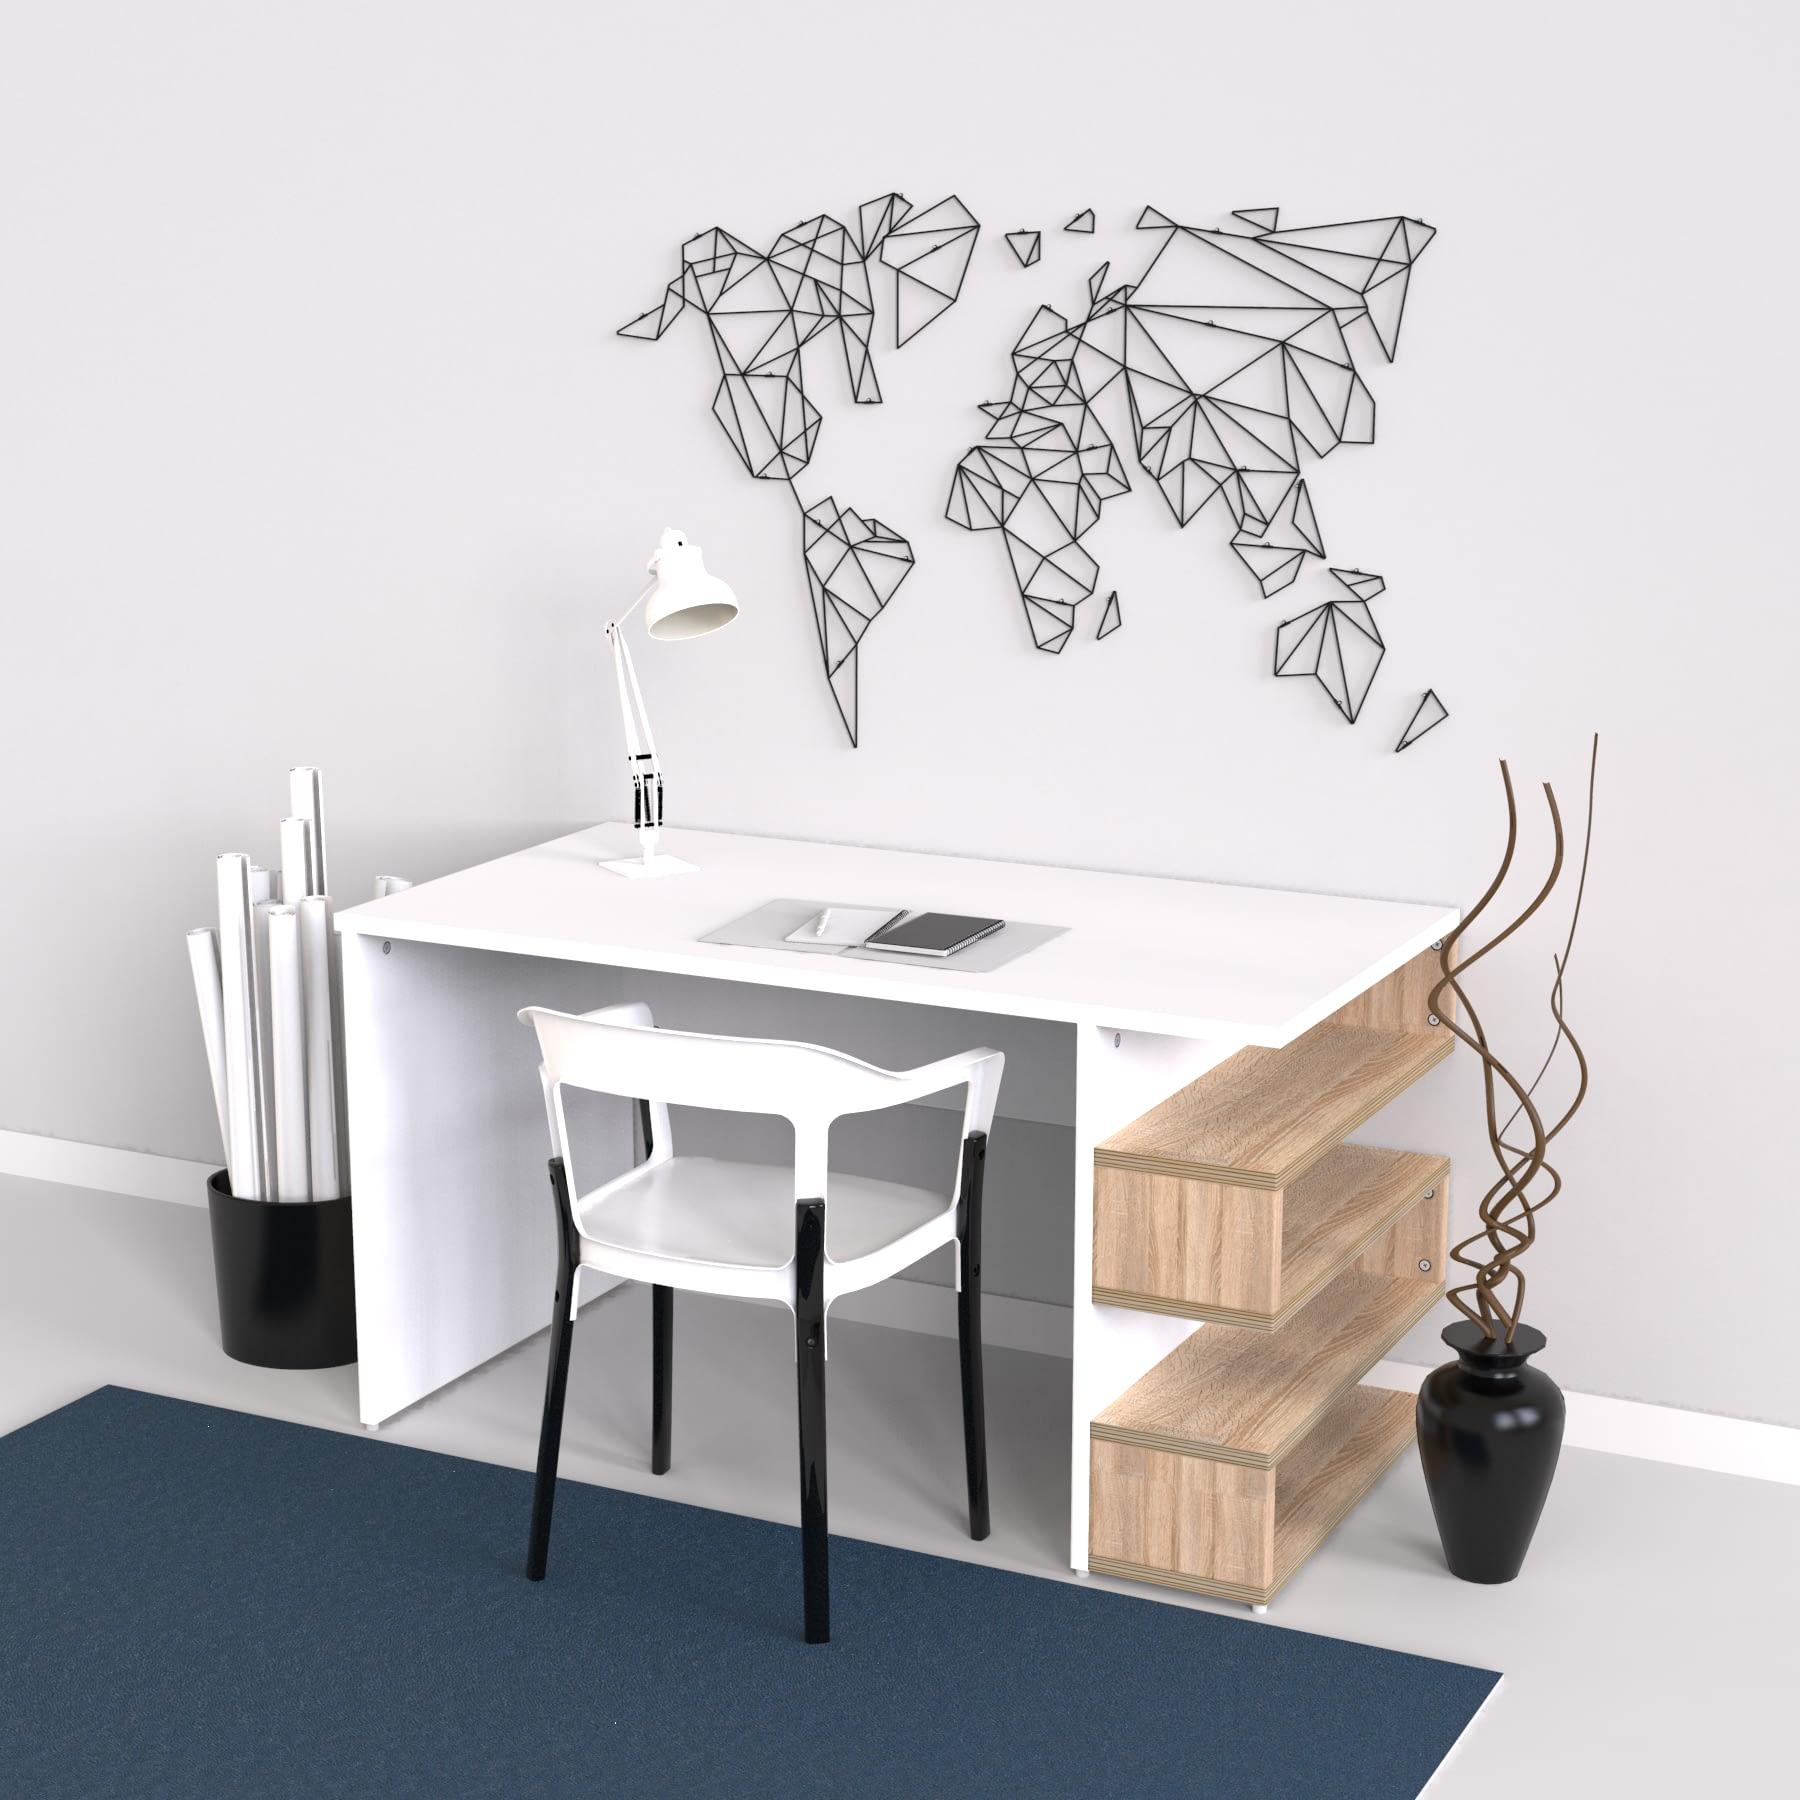 Mimilos M4 Study Desk